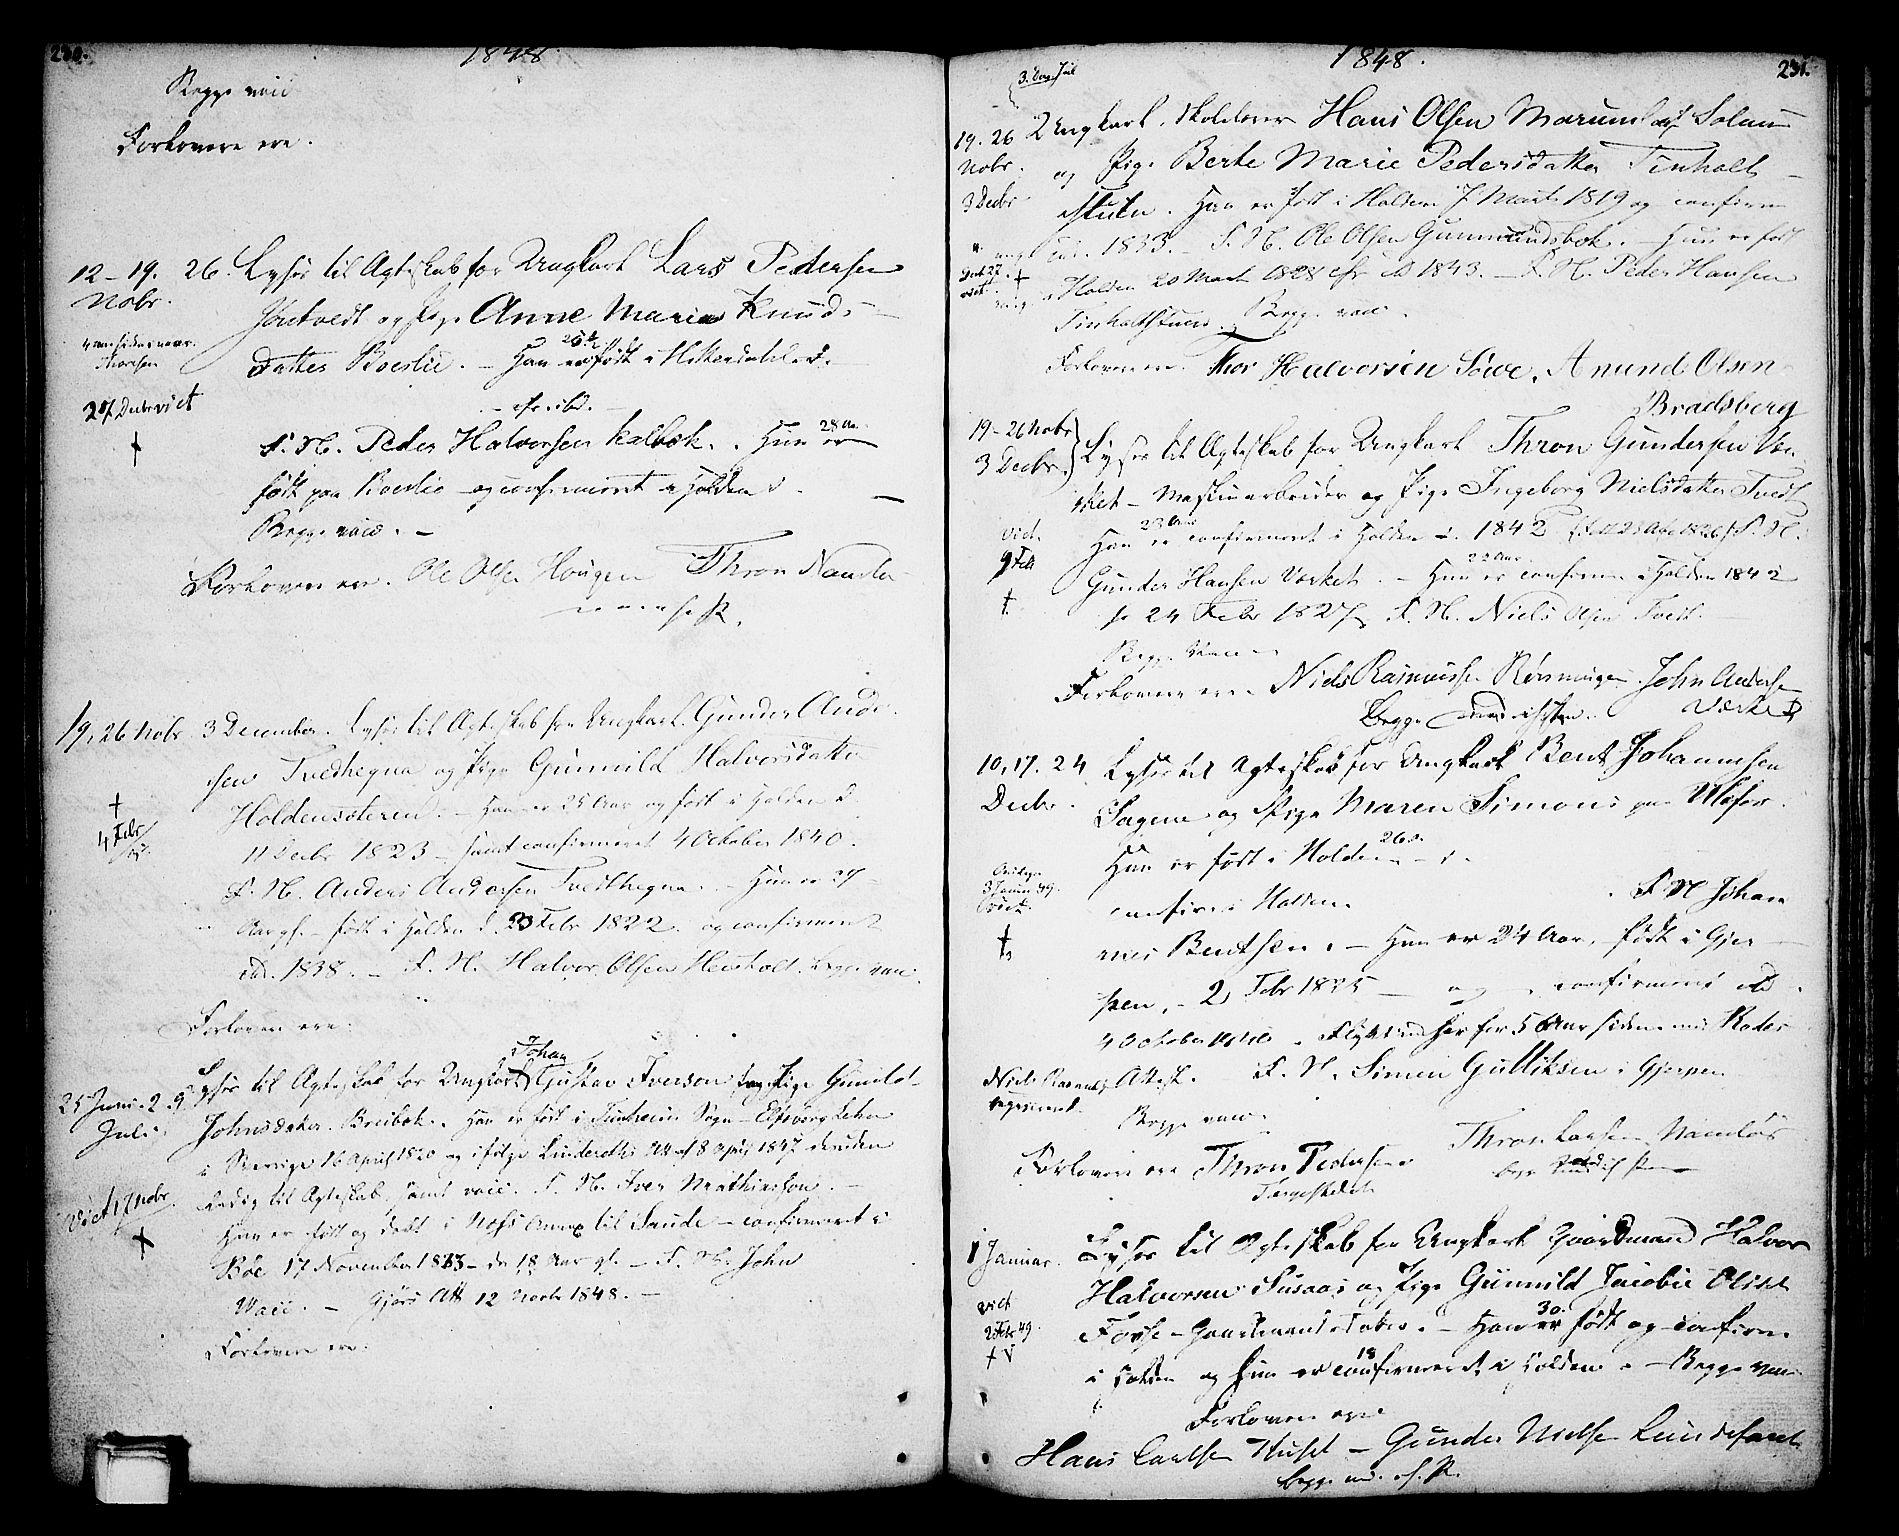 SAKO, Holla kirkebøker, F/Fa/L0002: Ministerialbok nr. 2, 1779-1814, s. 230-231